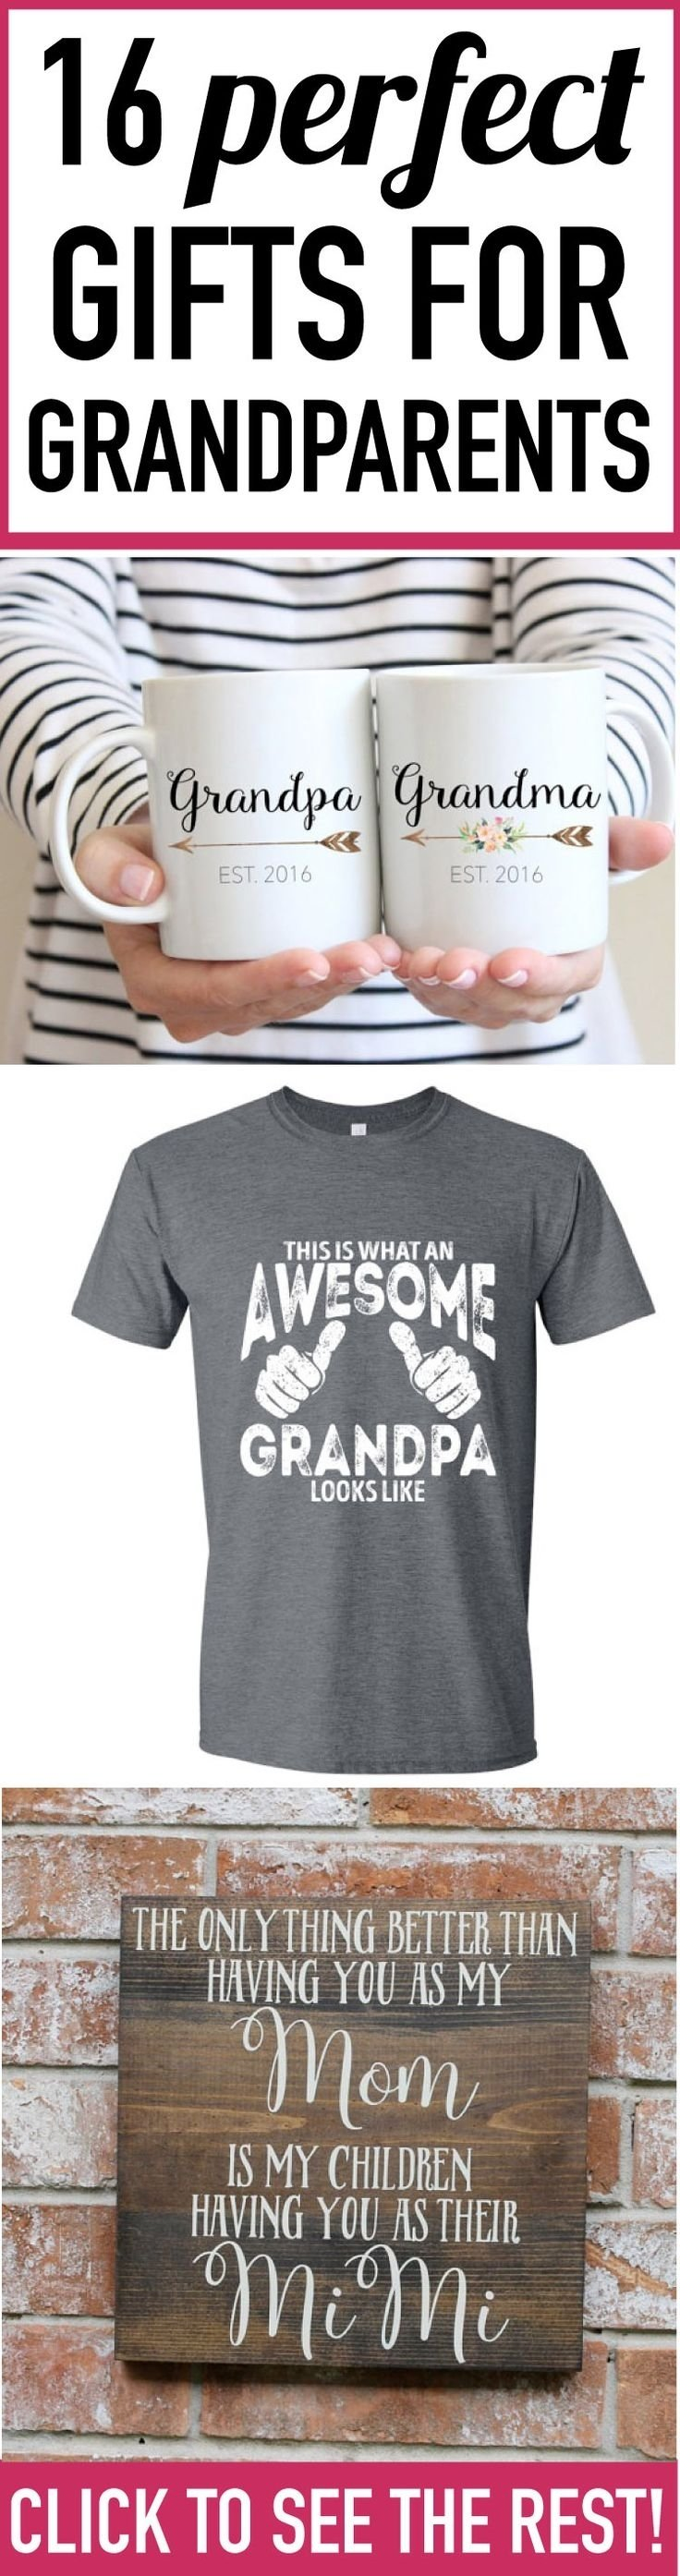 10 Fantastic Gift Ideas For Adult Children 284 best christmas gift ideas images on pinterest christmas gift 2 2021